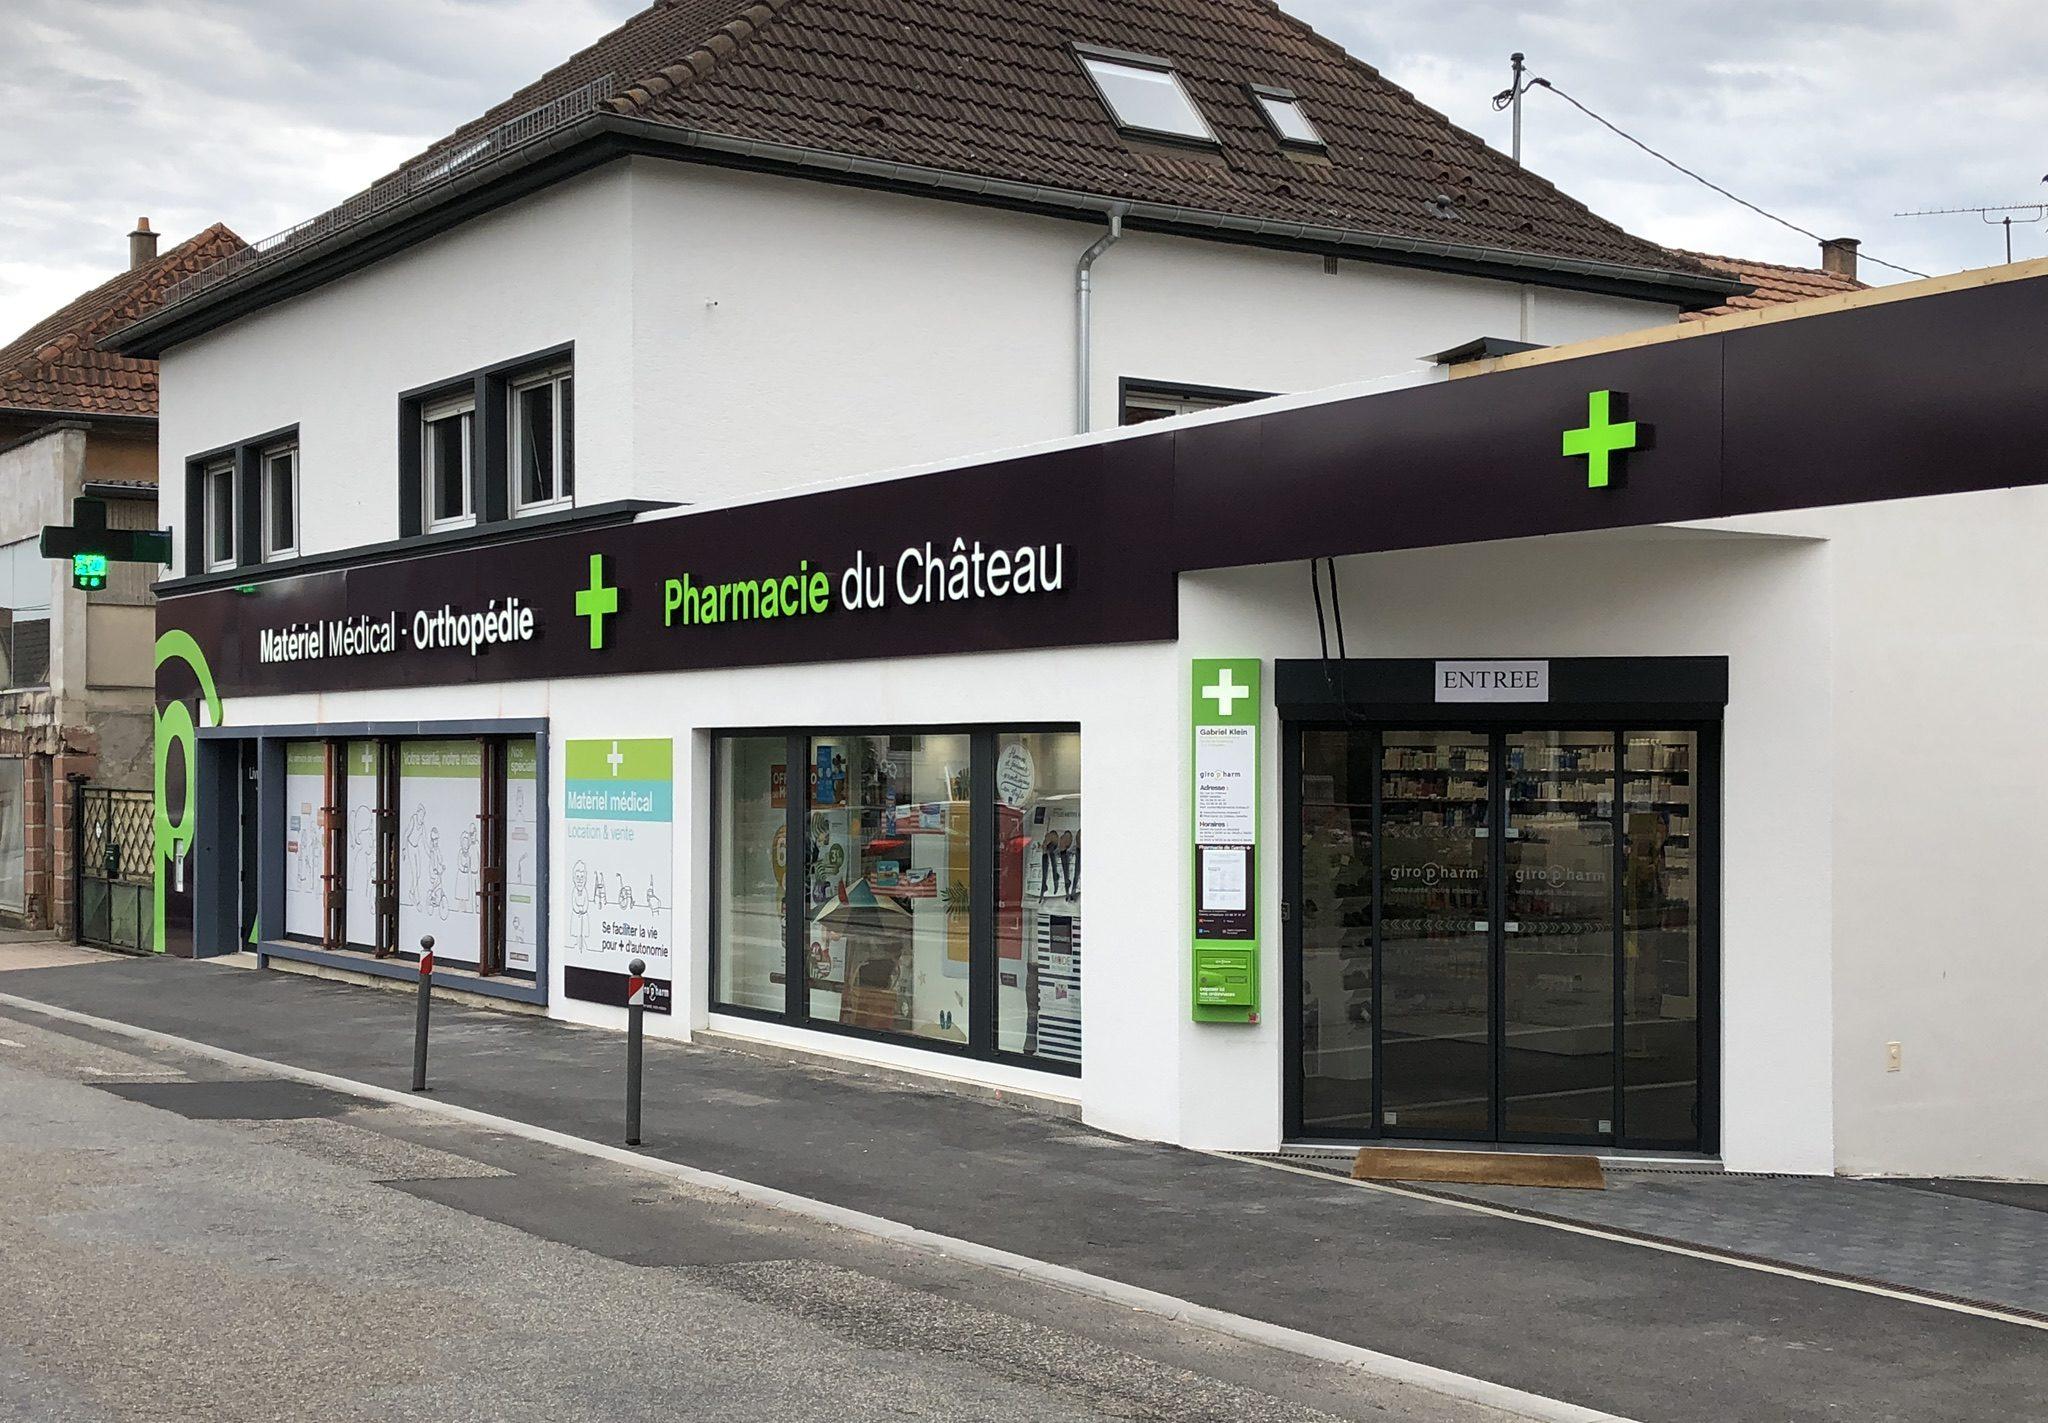 Pharmacie du Chateau_photo1